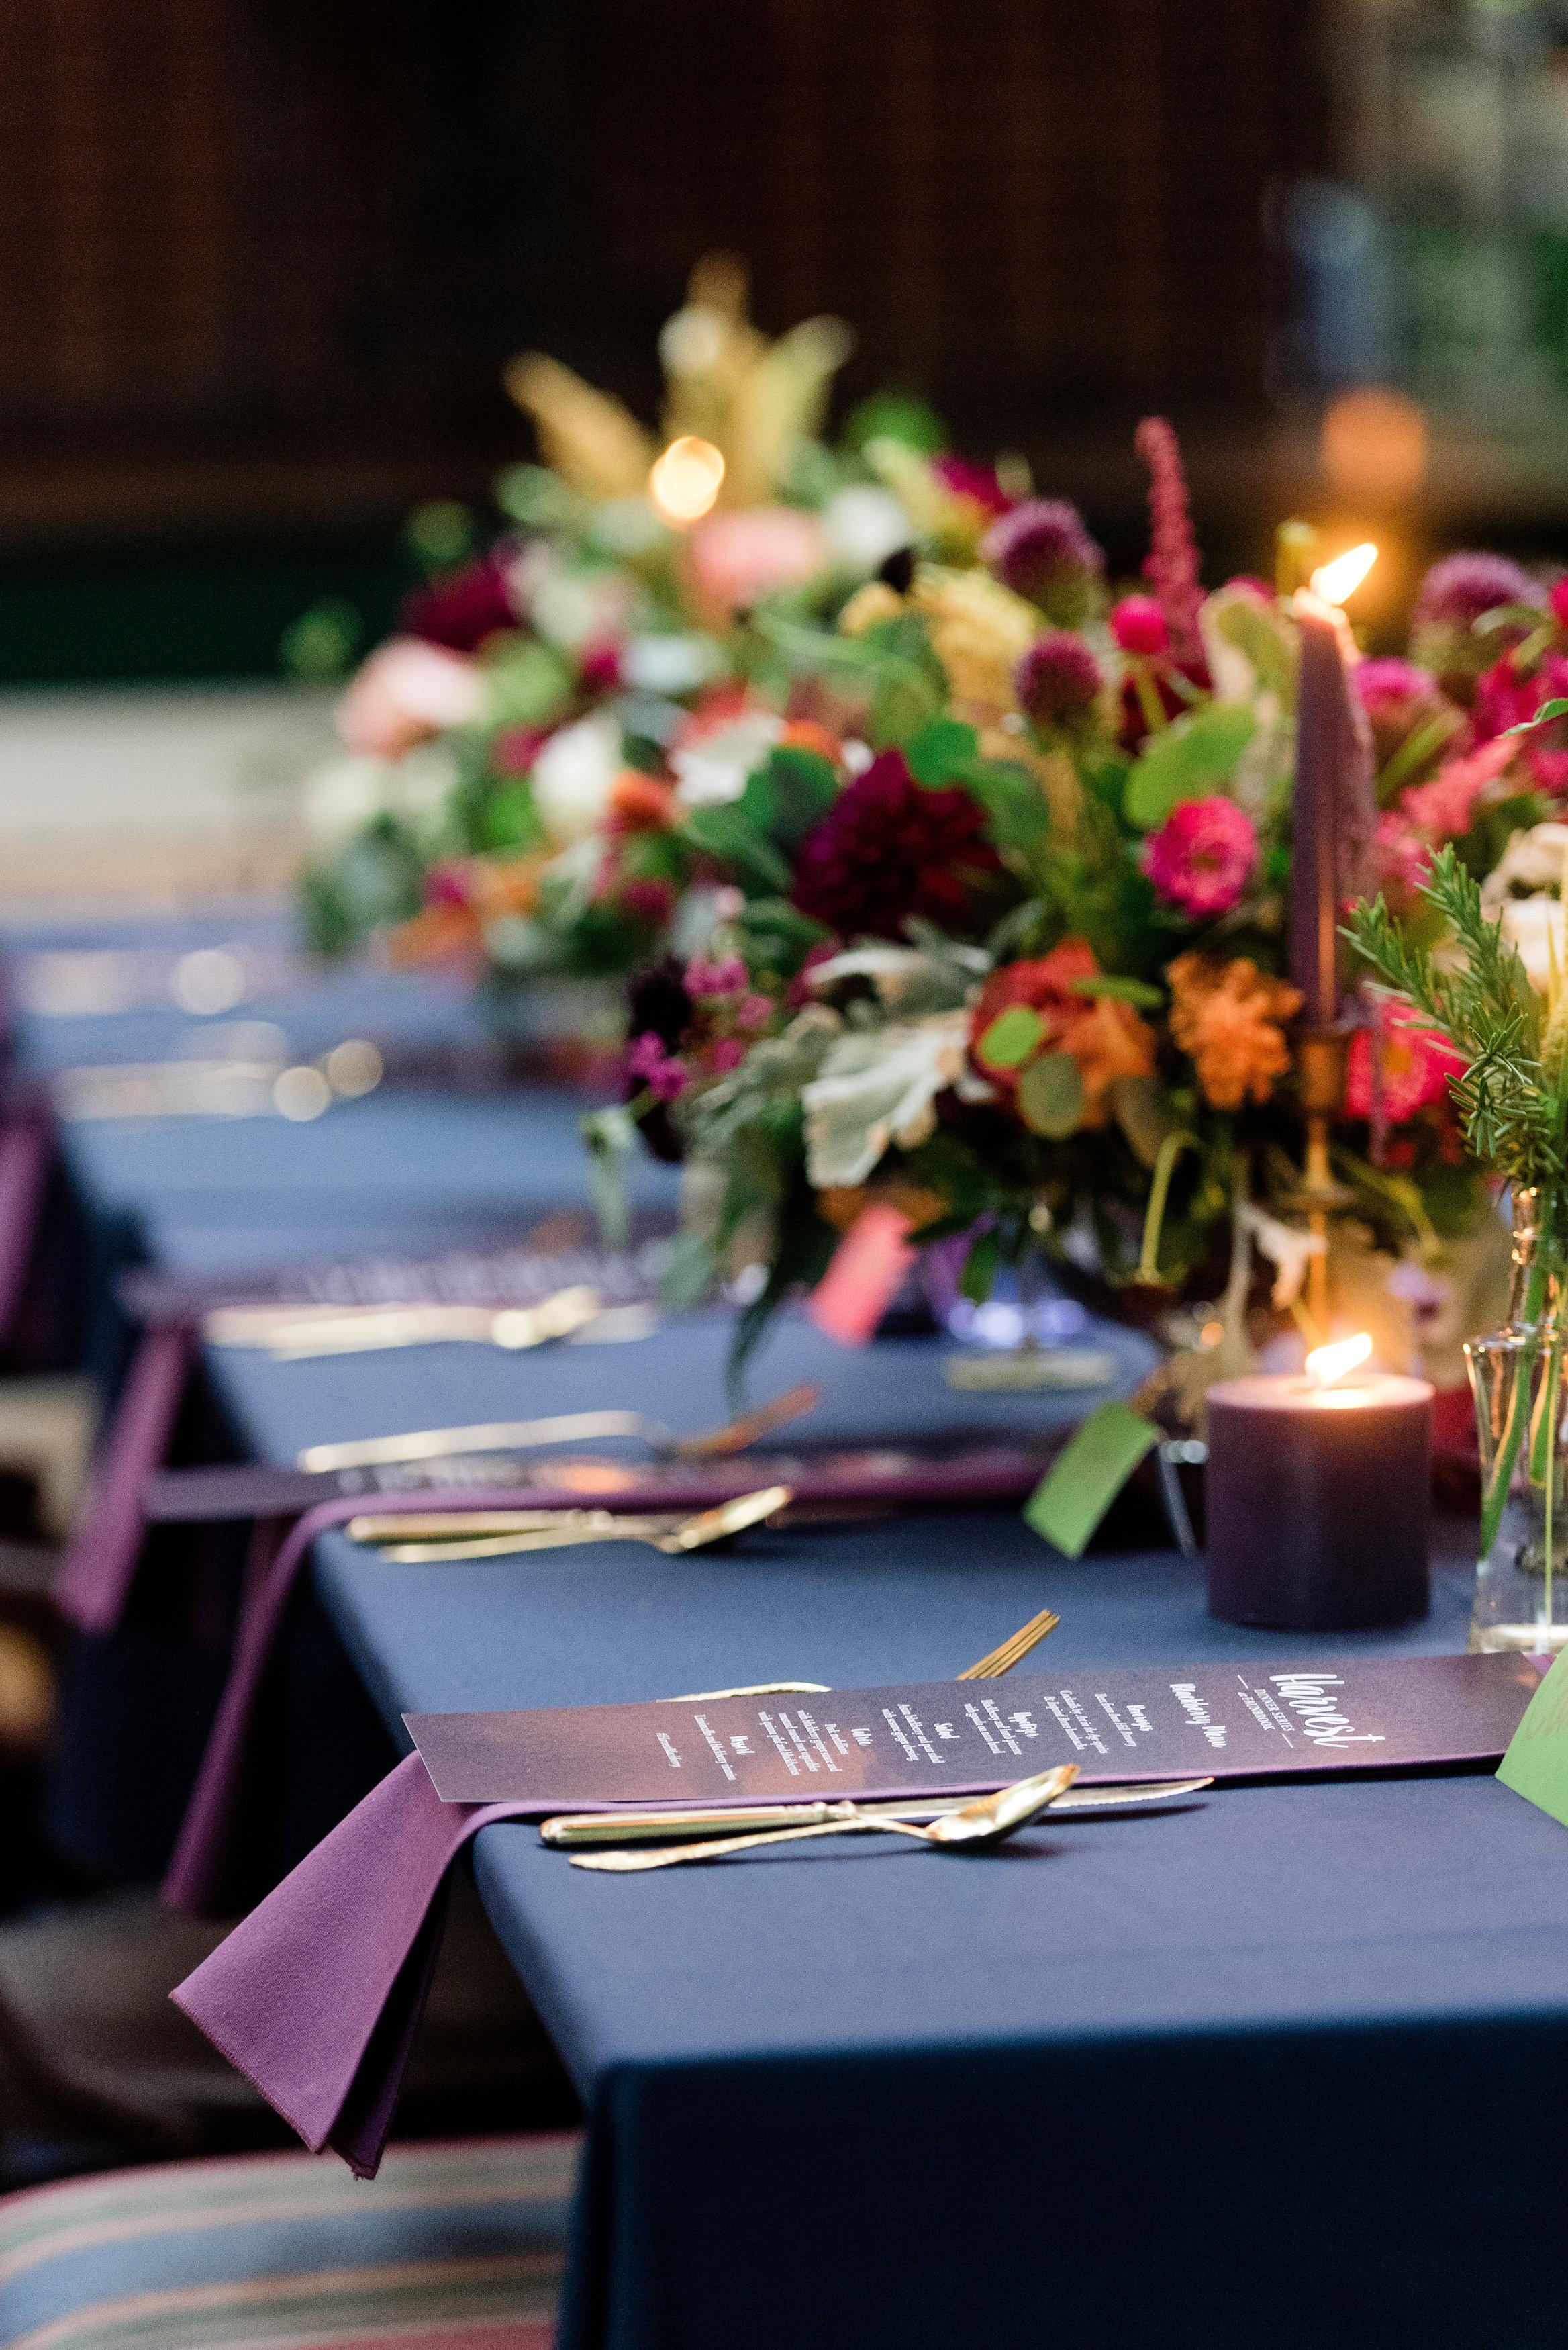 West-Chester-PA-Faunbrook-Harvest-Dinner-Series-Blackberry-M2Photography-156.jpg